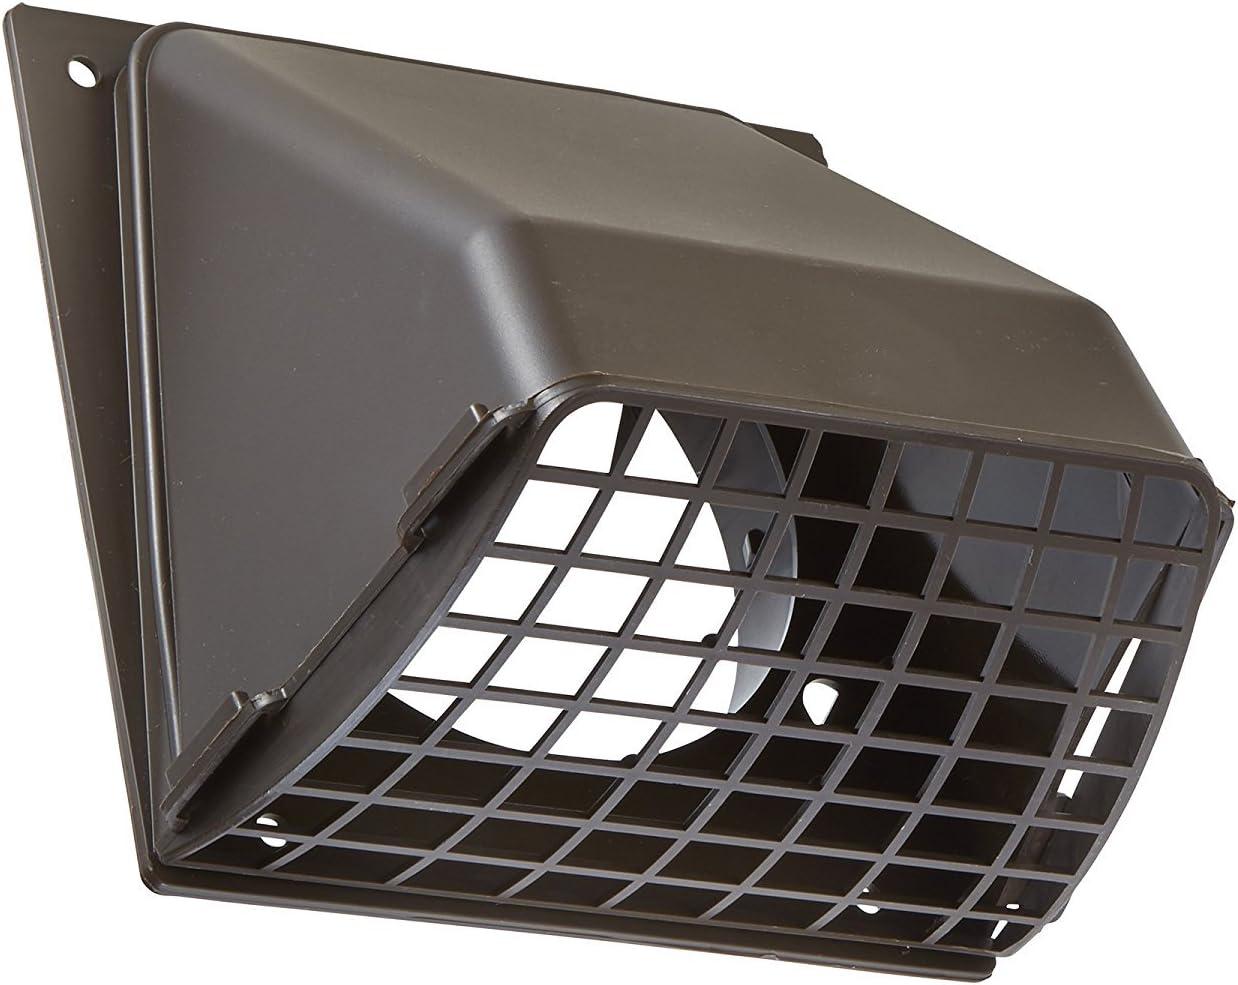 Lambro Industries Dryer Vent Hood (Brown)